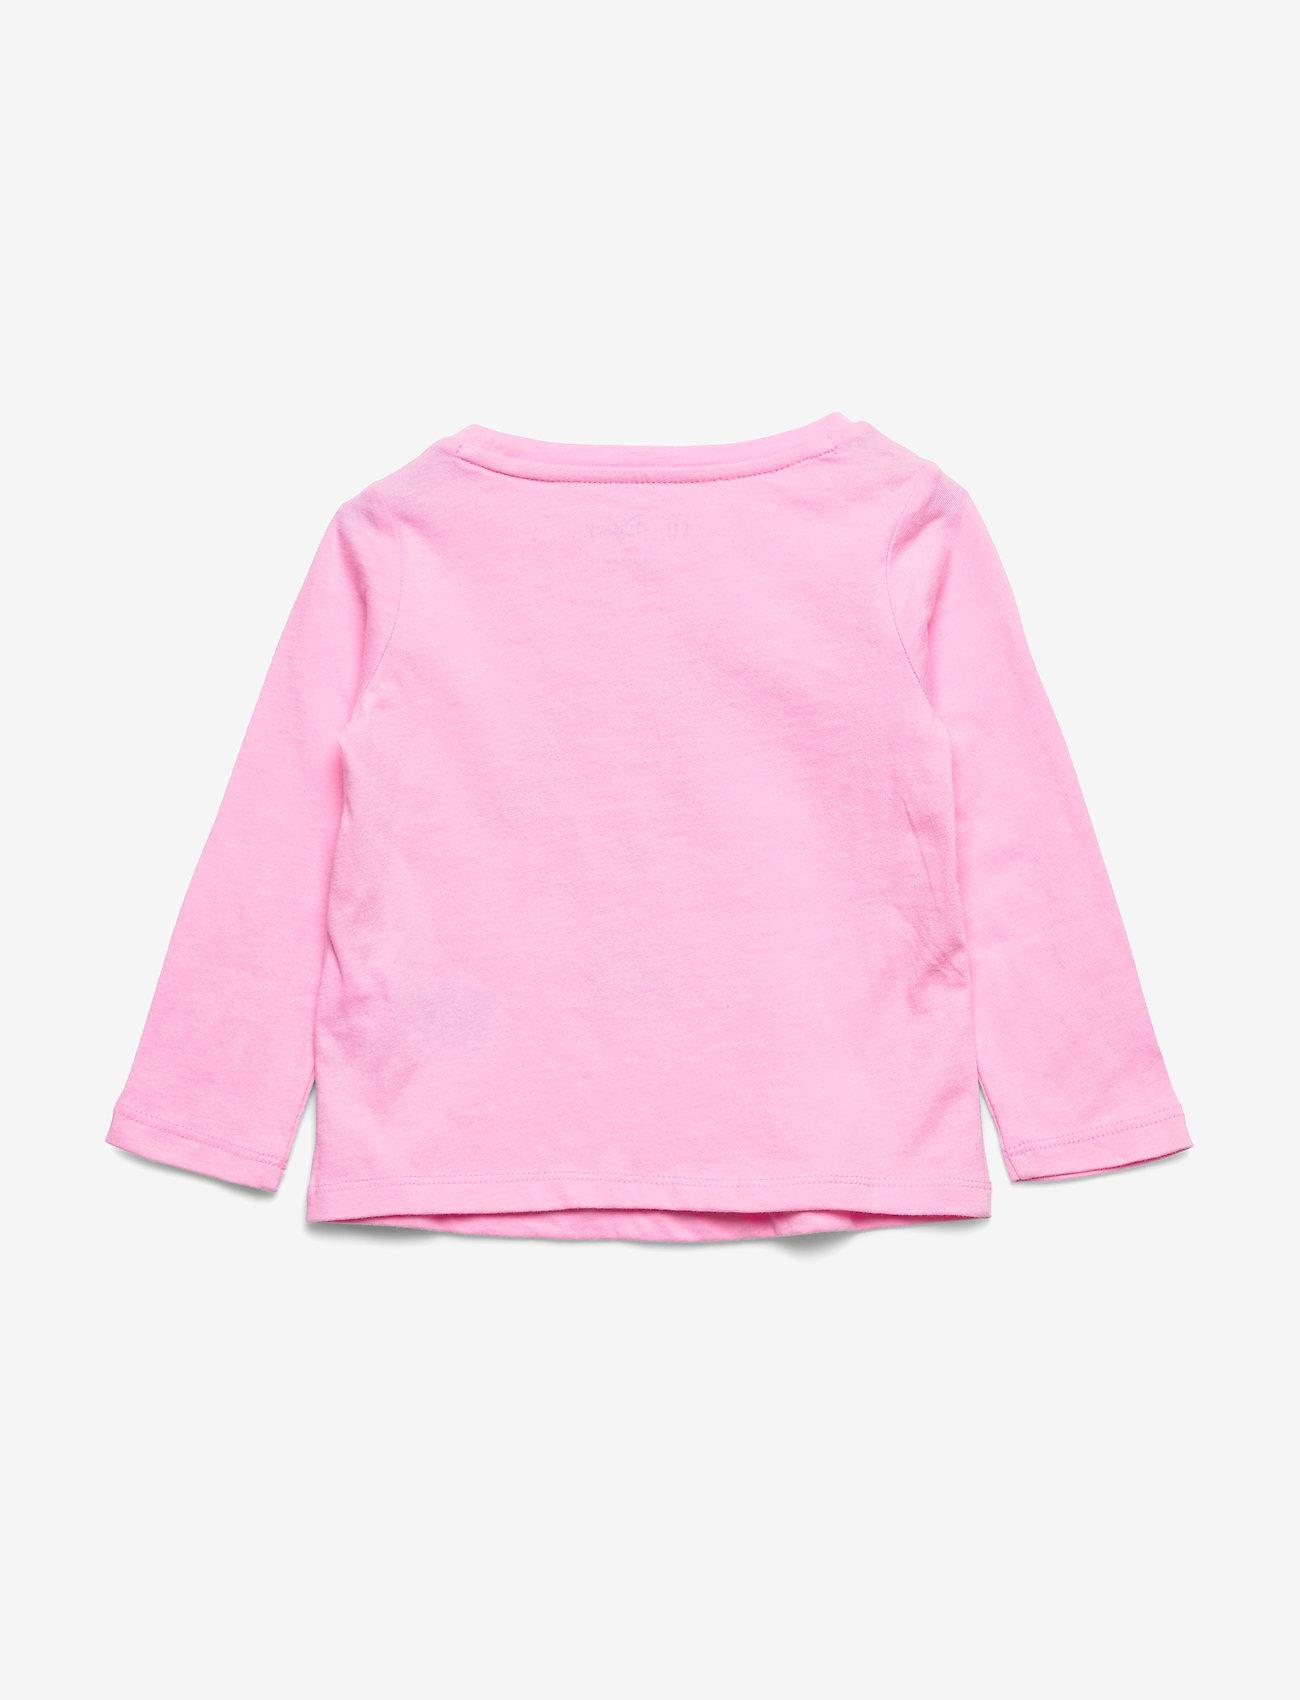 Gap Babygap | Disney Minnie Mouse T-shirt - Överdelar Parisian Pink